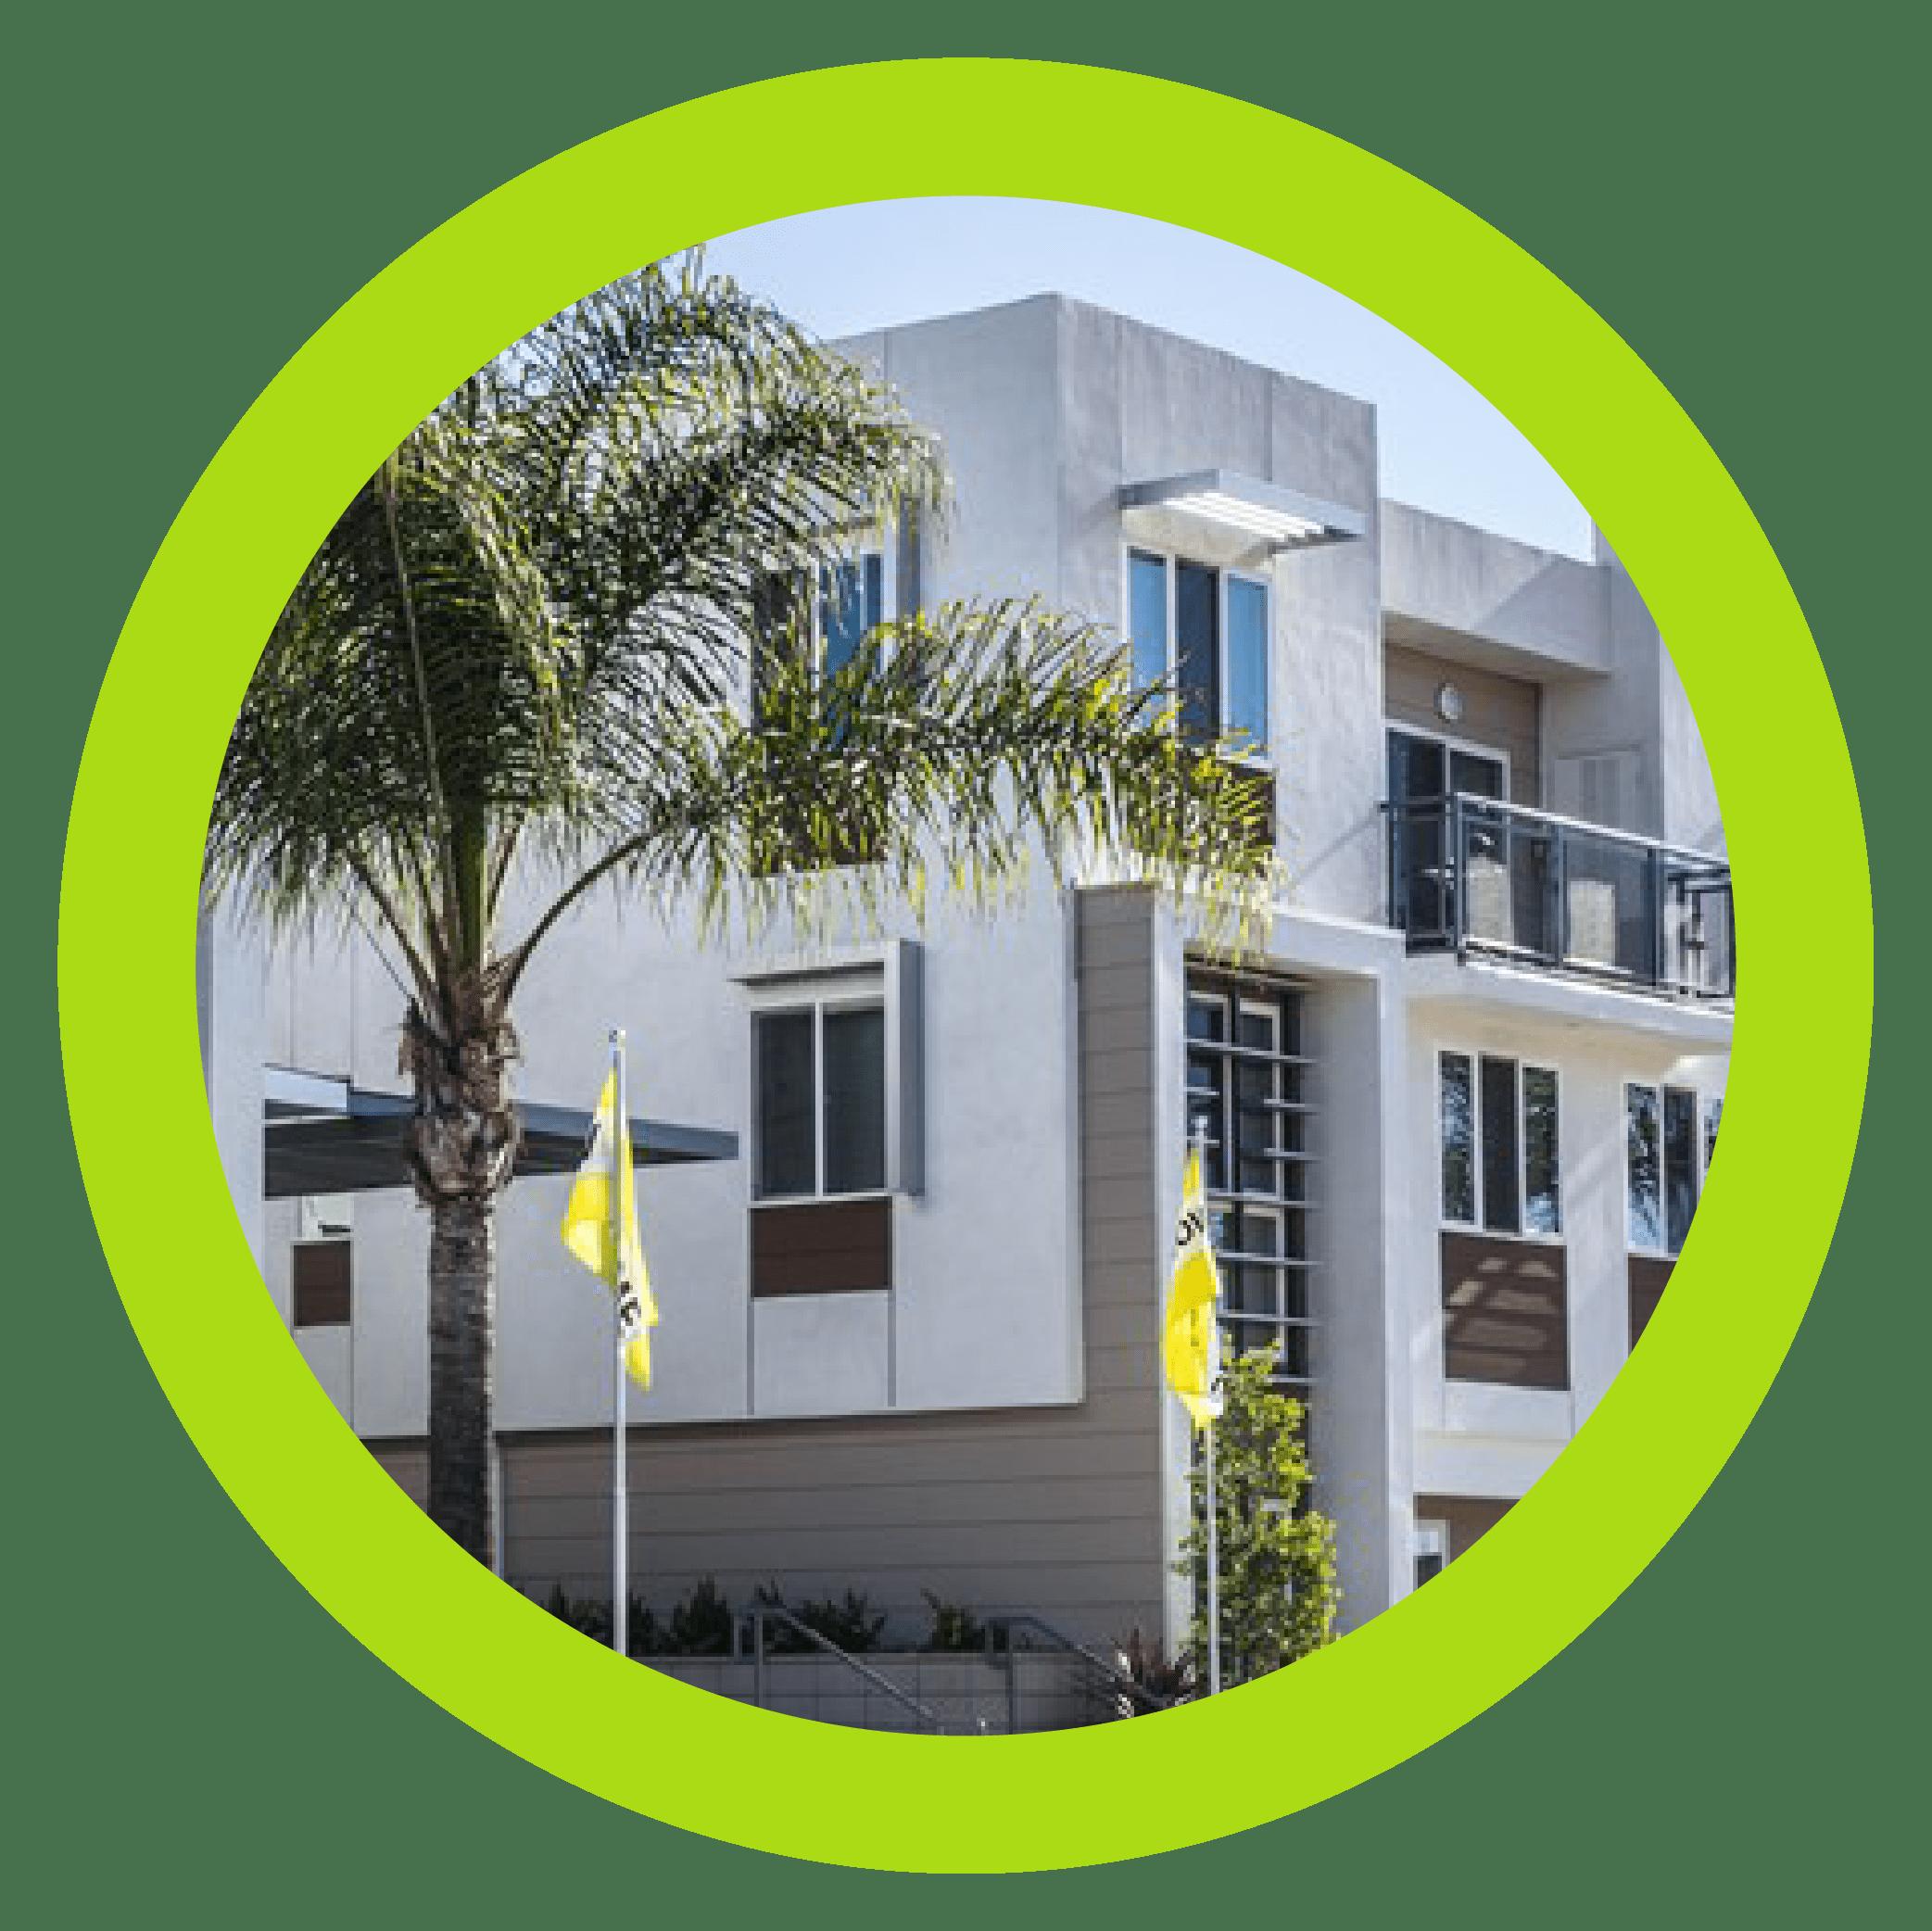 Link to neighborhood info for Citron in Ventura, California